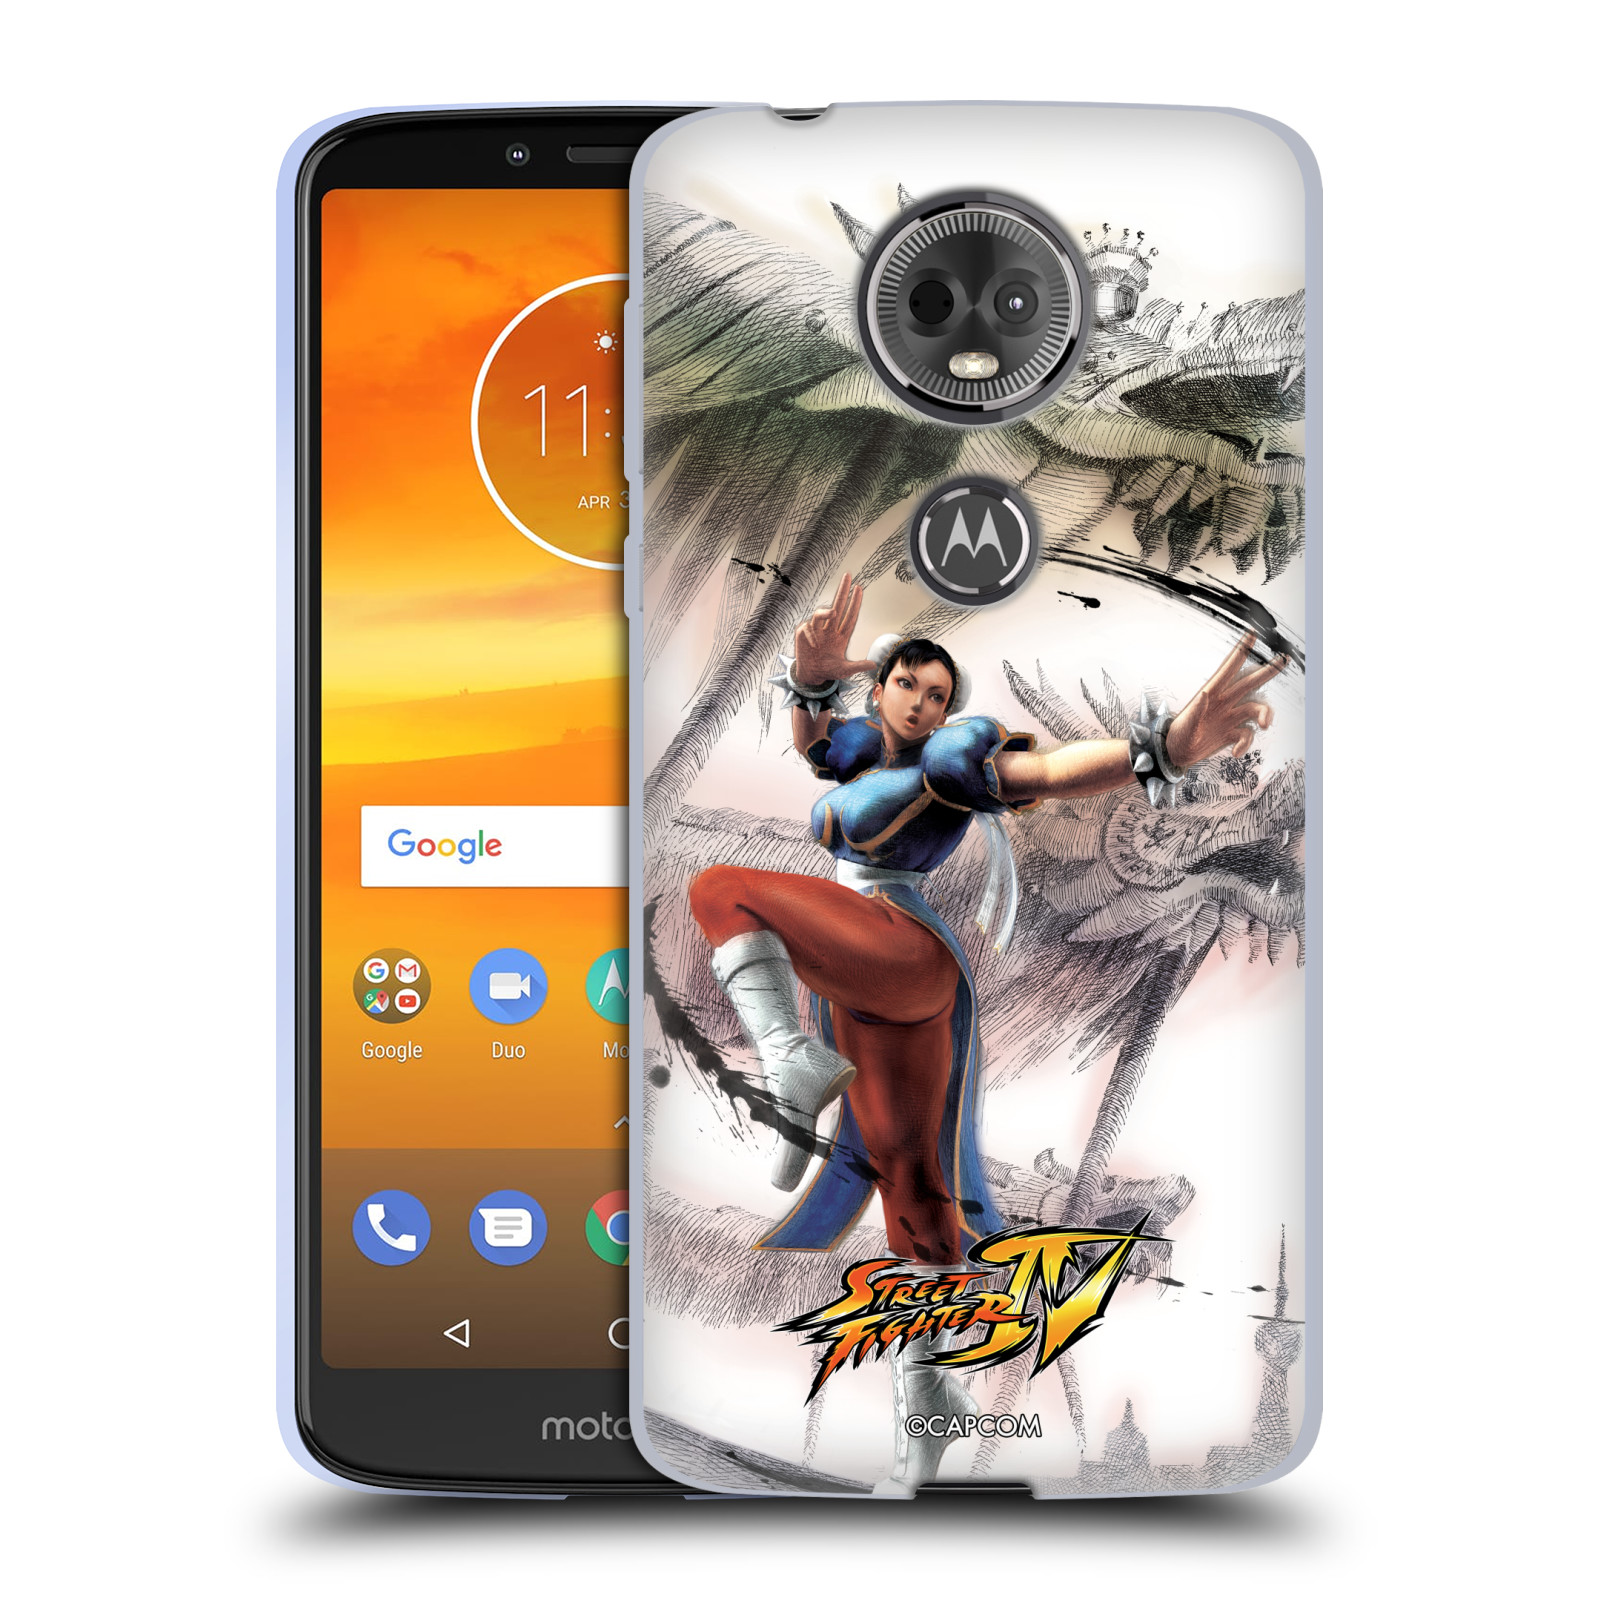 HEAD CASE silikonový obal na mobil Motorola Moto E5 PLUS oficiální kryt STREET FIGHTER bojovnice Chun-Li kresba